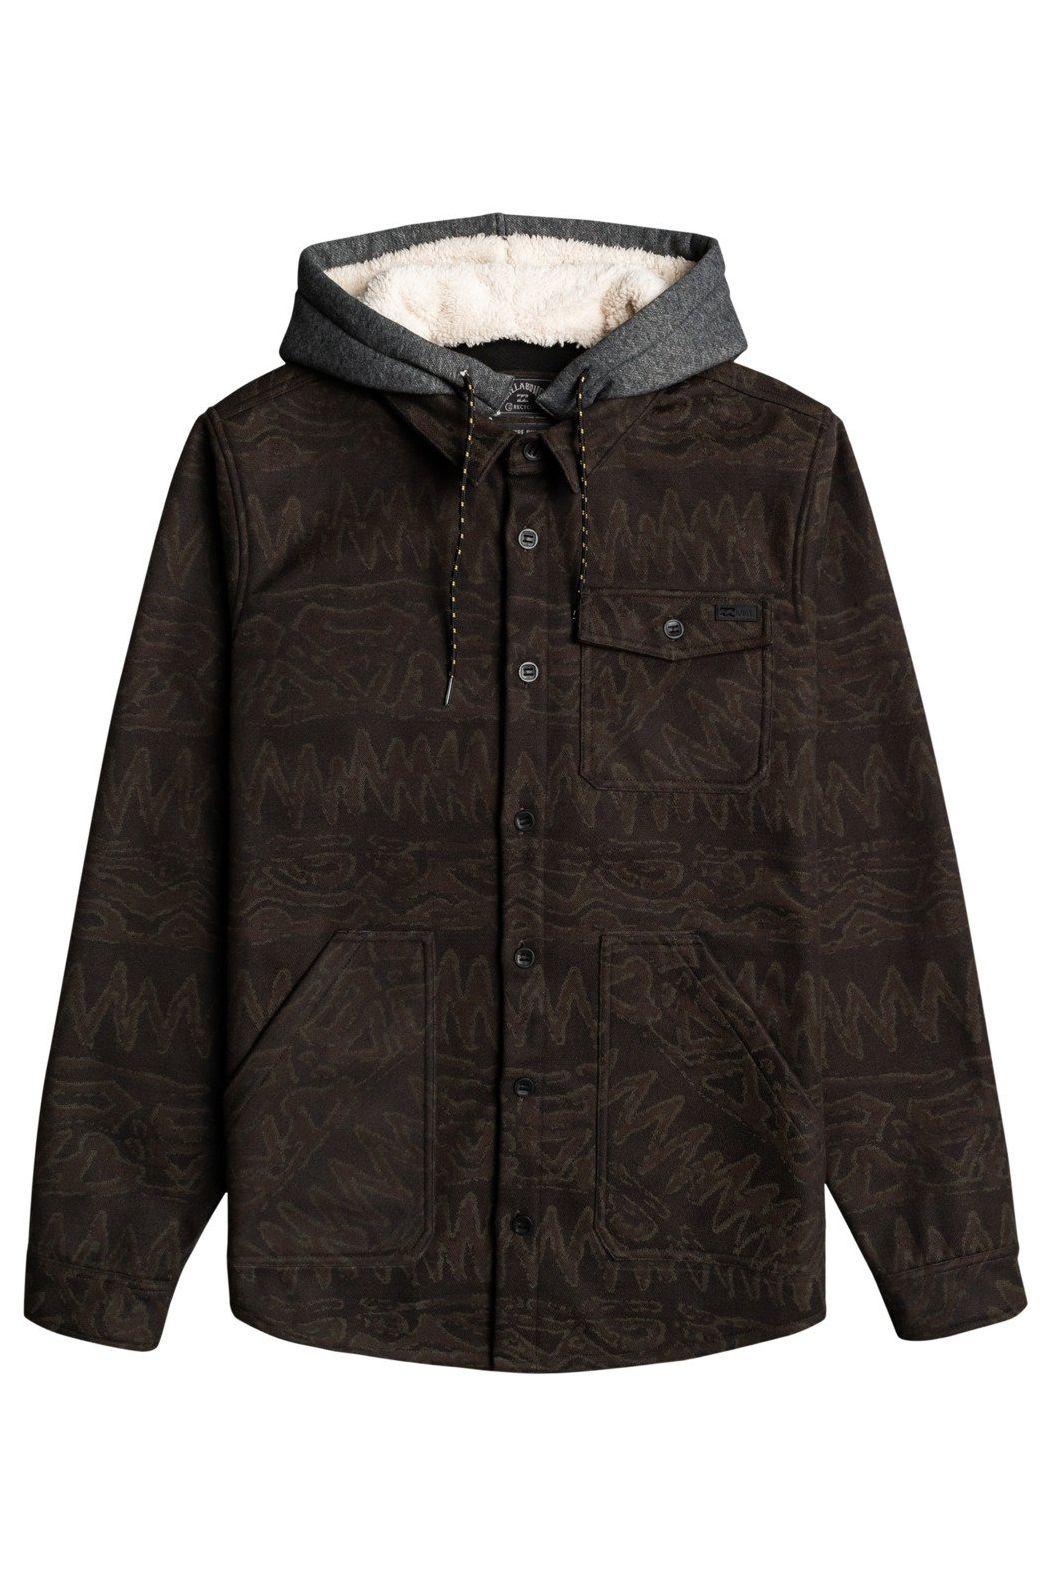 Billabong Shirt FURNACE BONDED FLANN ADVENTURE DIVISION Black